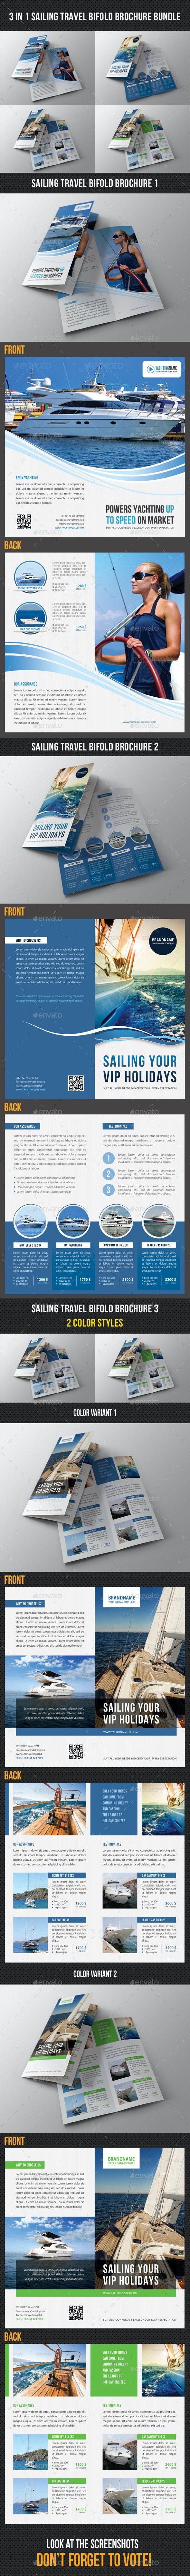 3 in 1 Sailing Travel Bifold Brochure Bundle - Corporate Brochures